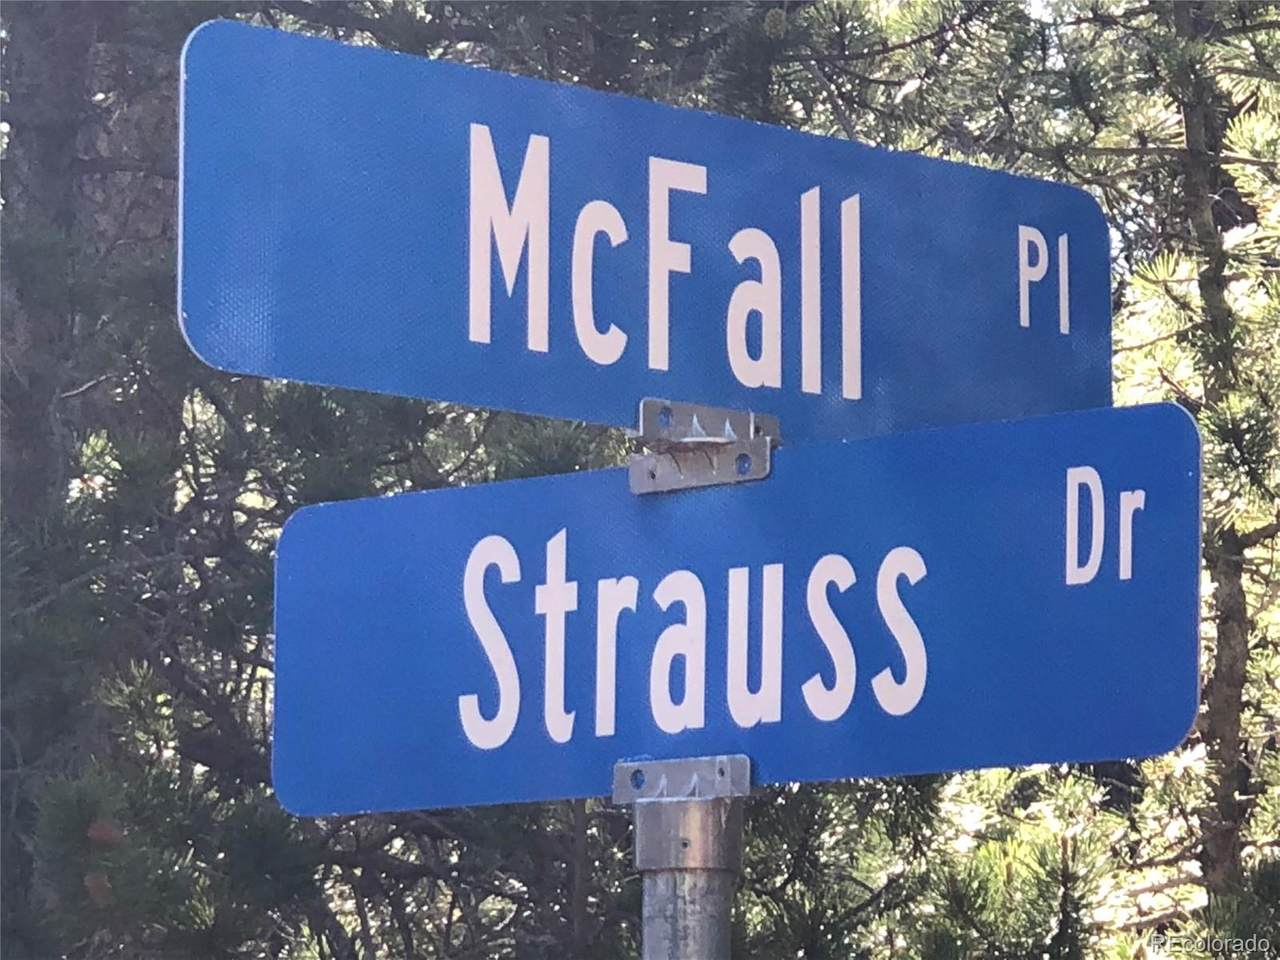 847 Strauss Lane - Photo 1